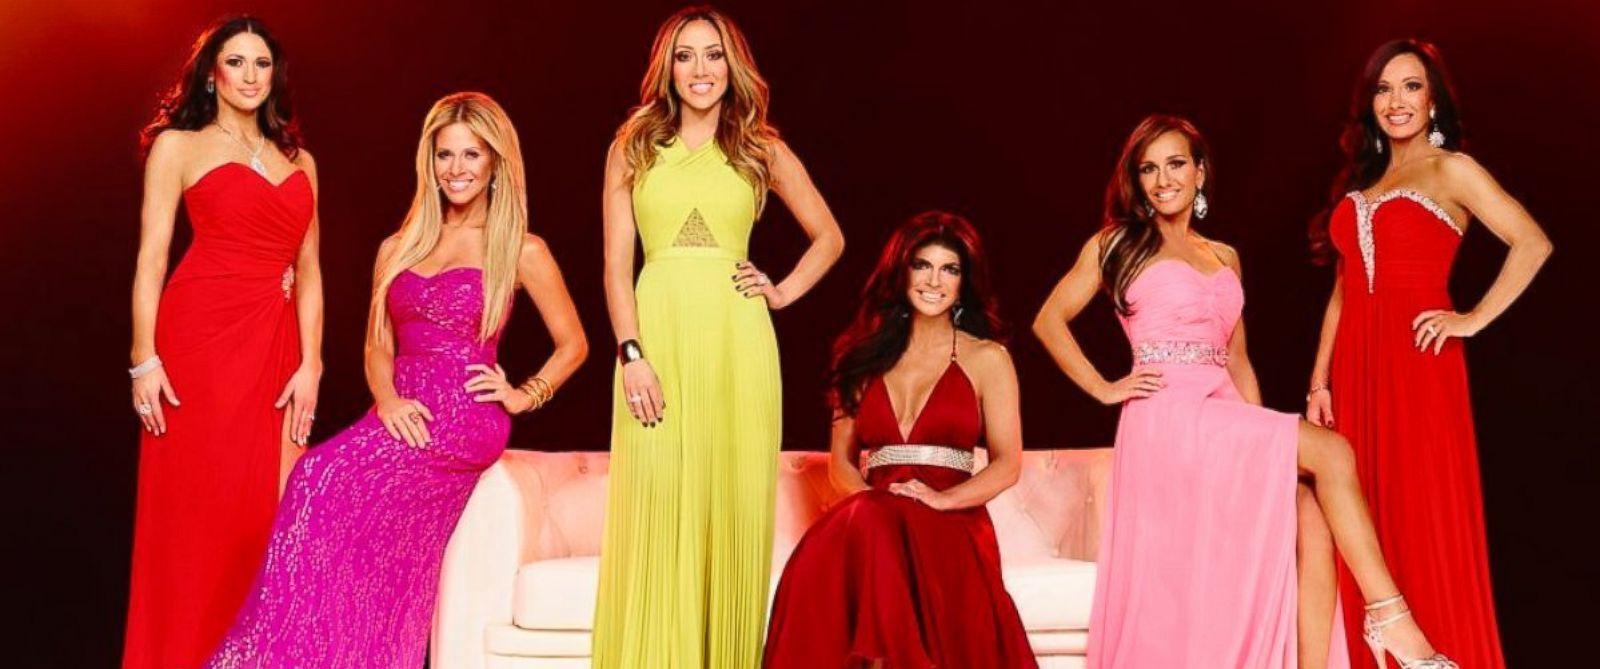 PHOTO: Amber Marchese, Dina Manzo, Melissa Gorga, Teresa Guidice, Nicole Mauriello, Teresa Aprea.